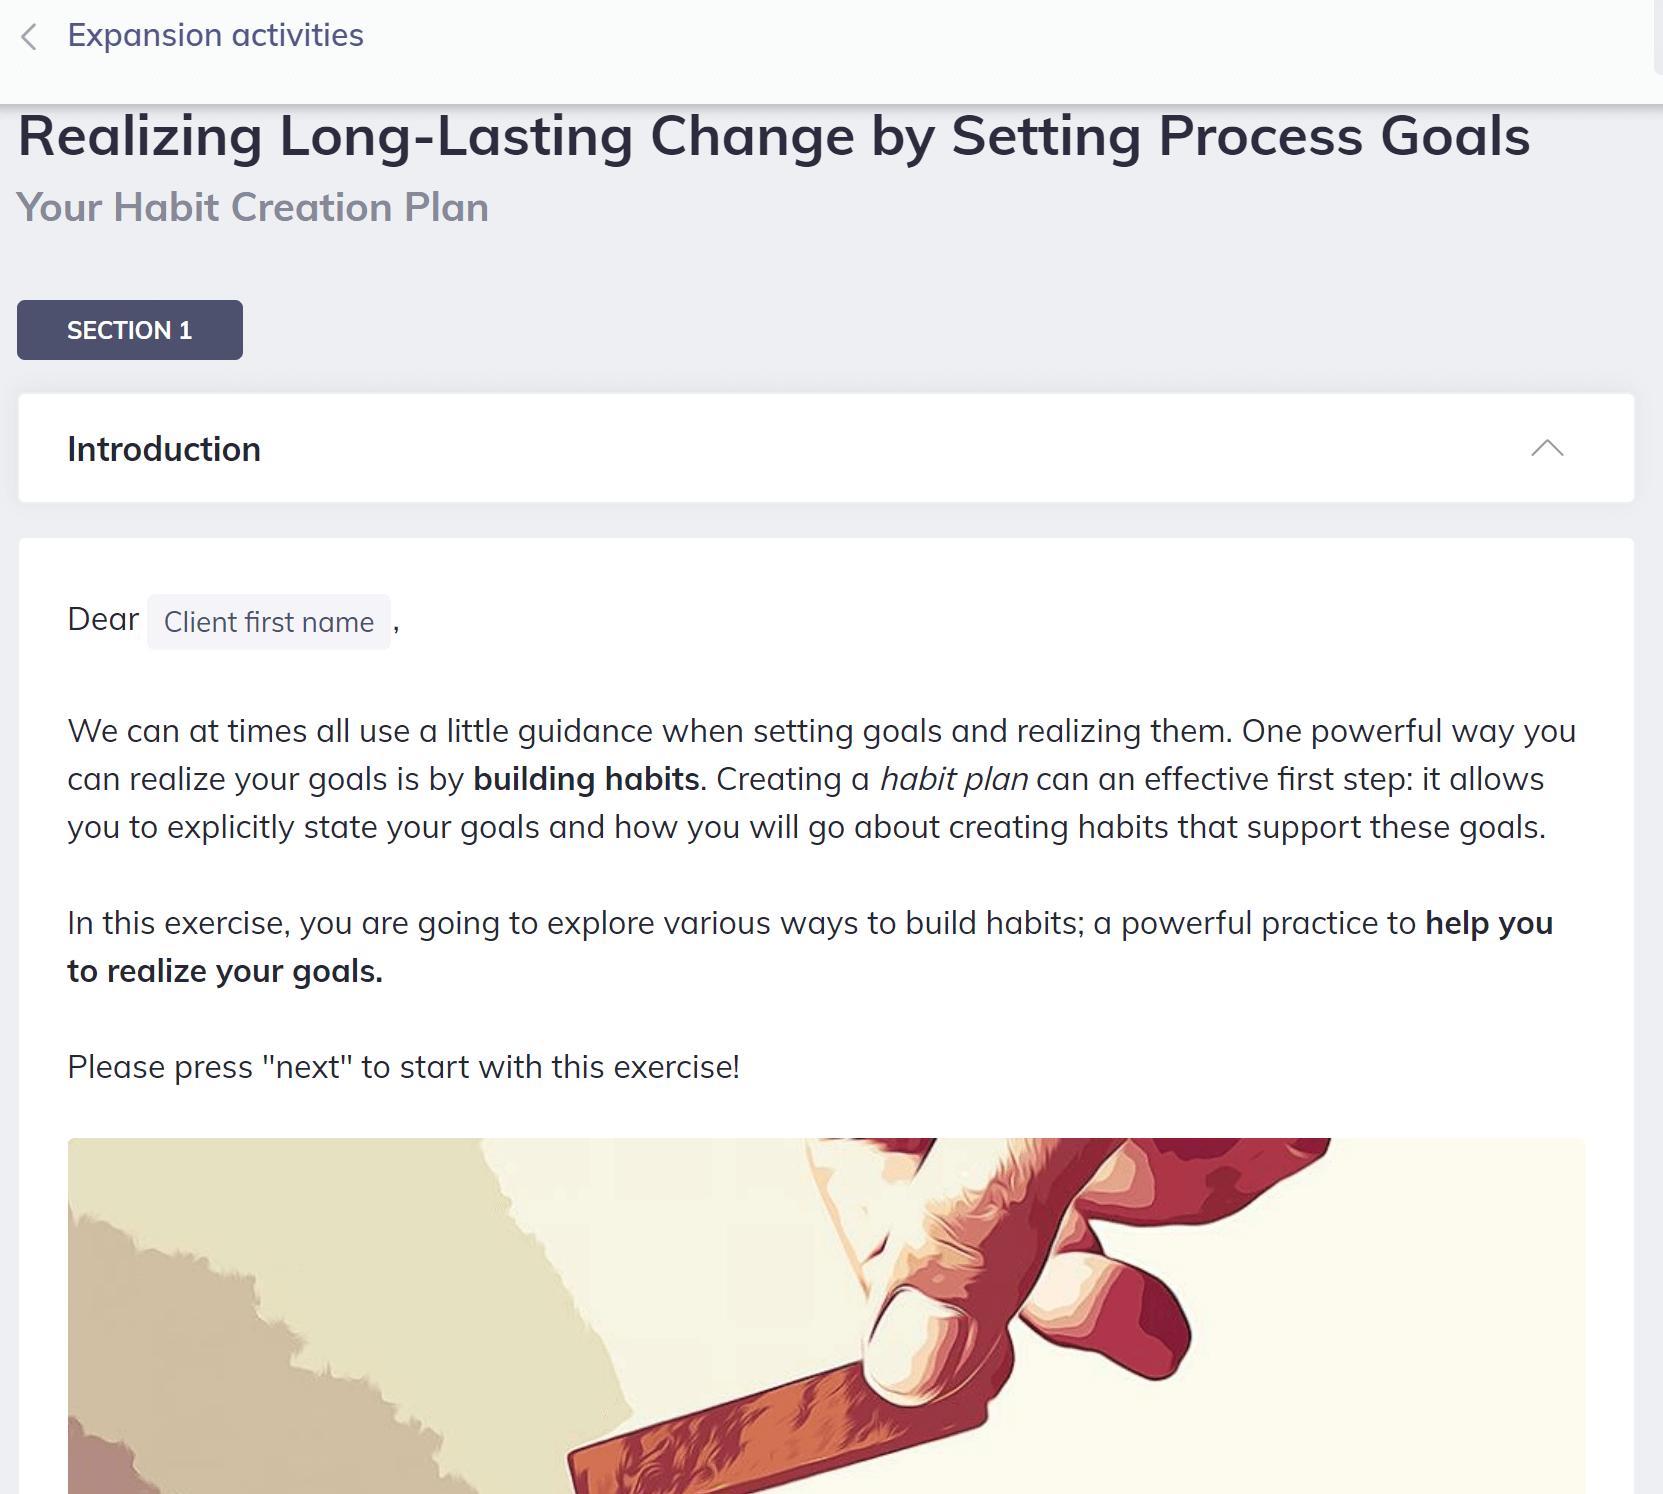 Realizing Long-Lasting Change Quenza High Performance Coaching Program